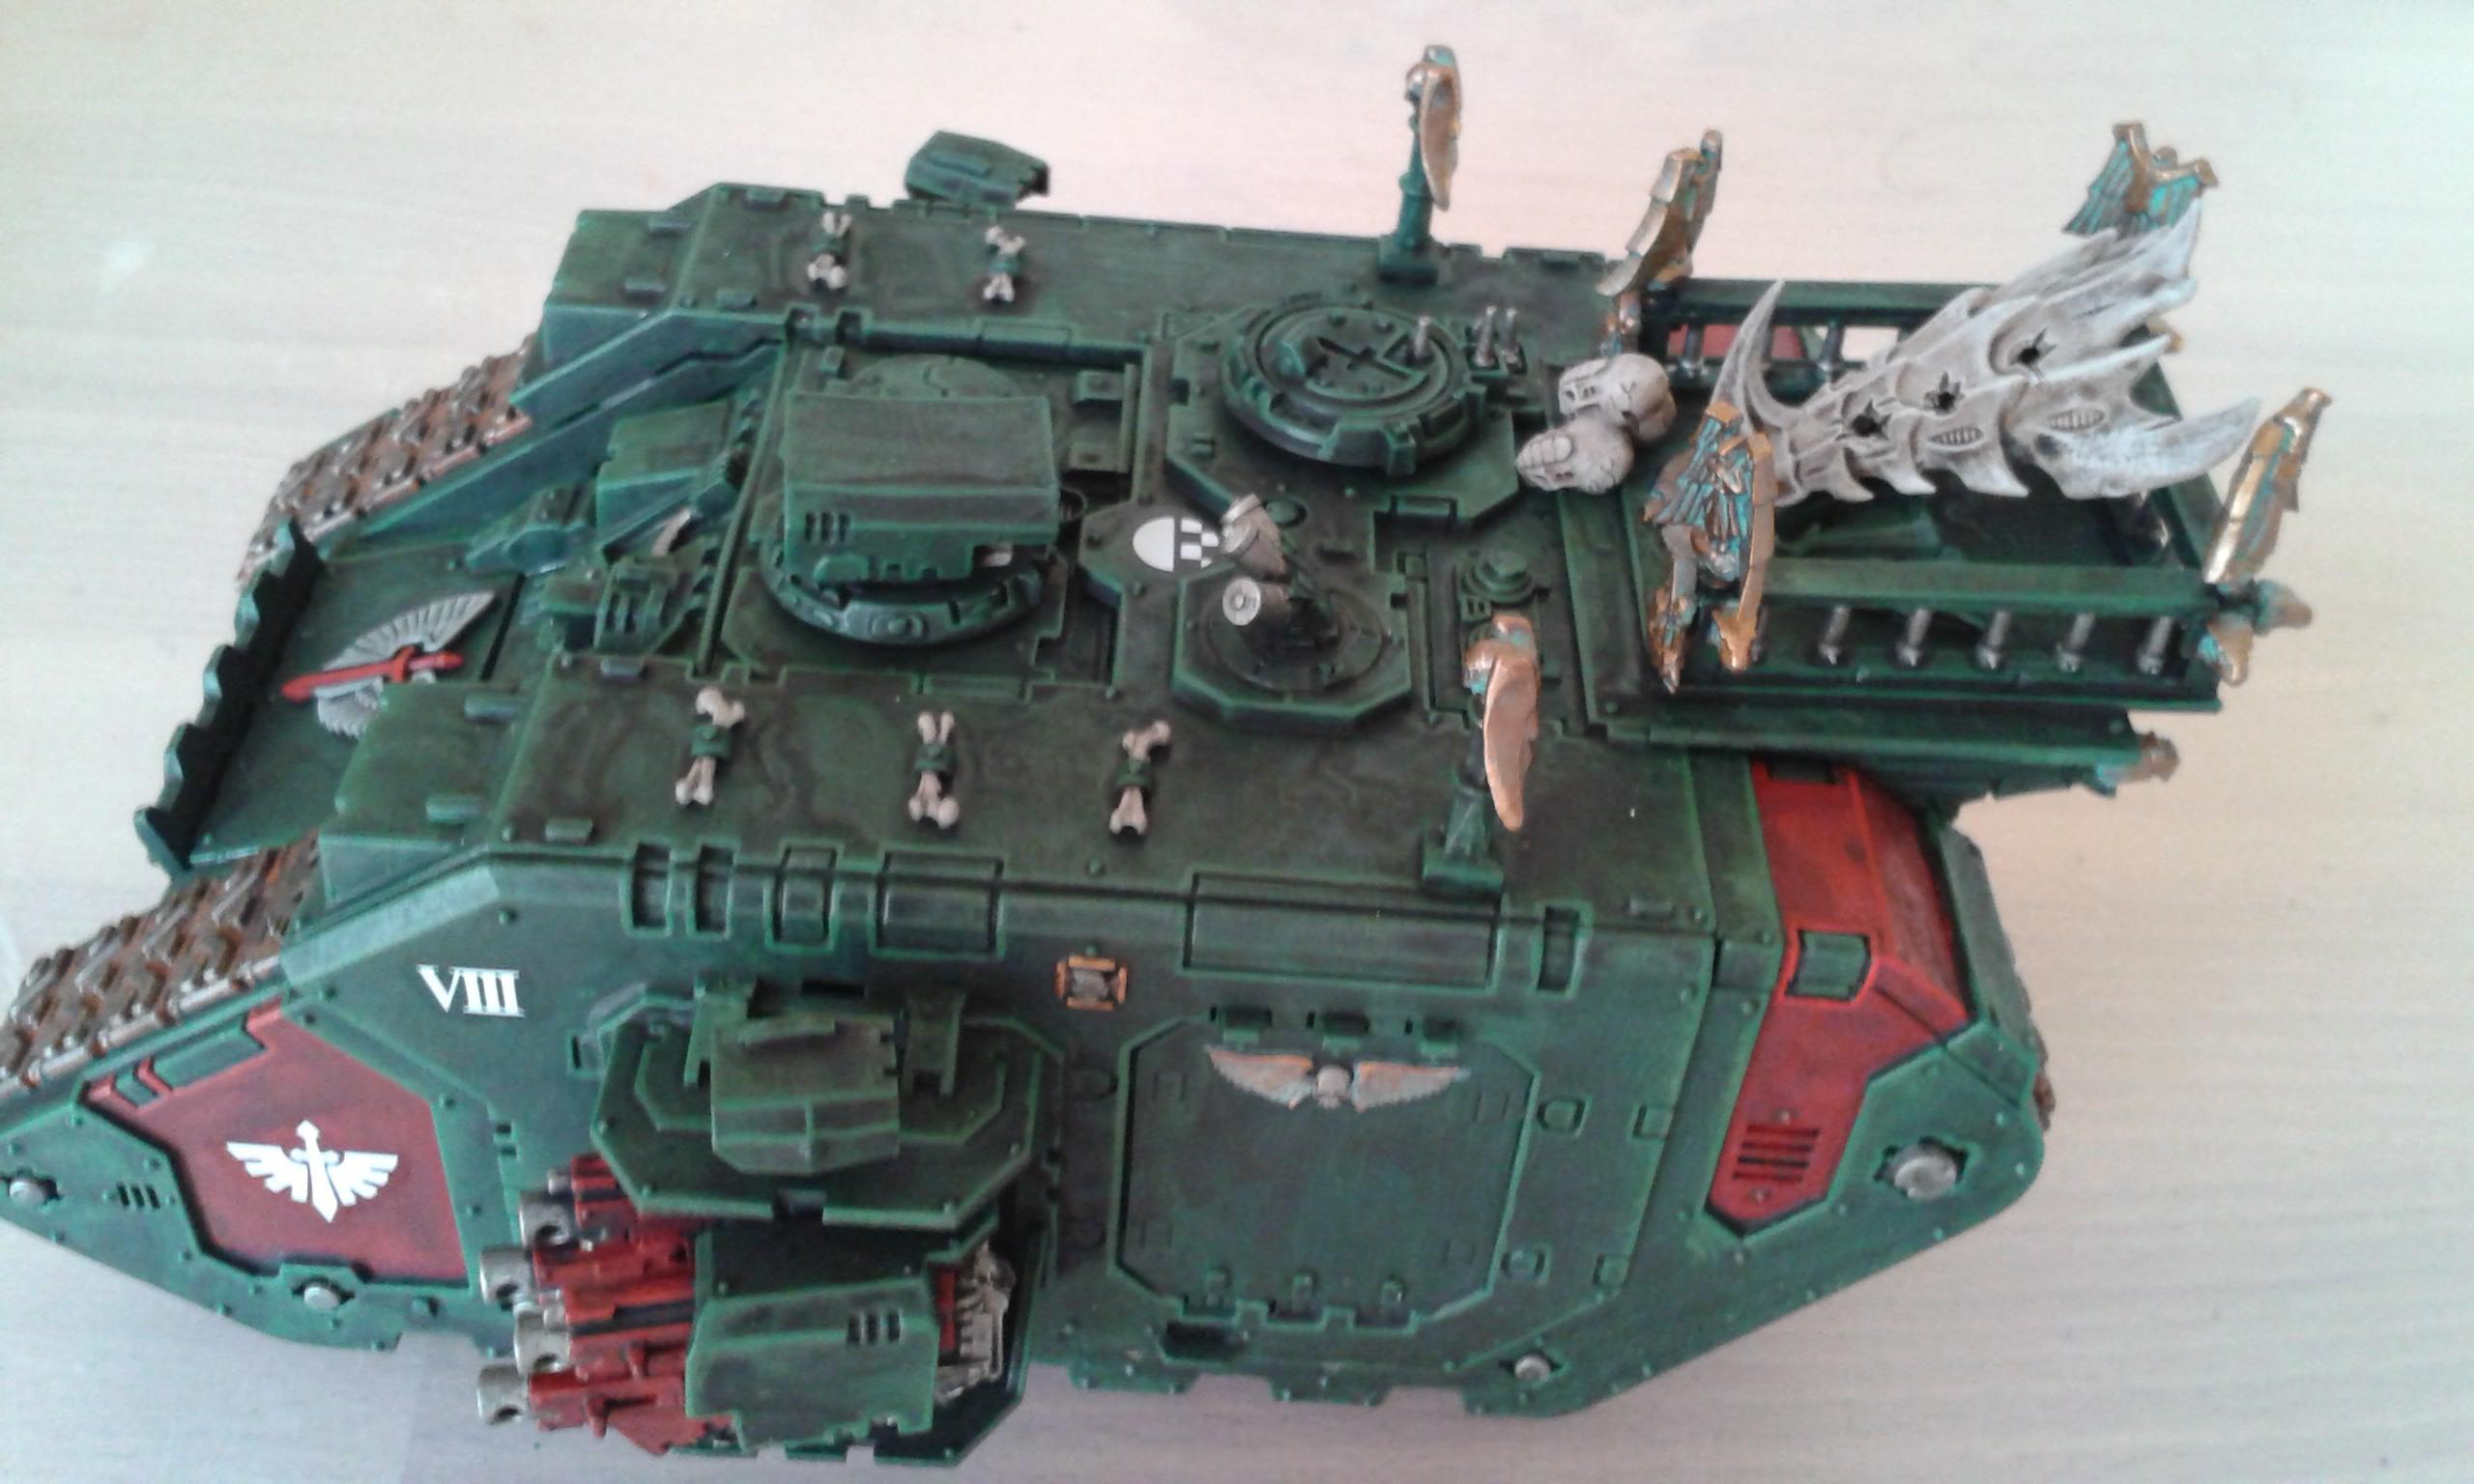 Conversion, Dark Angels, Land Raider, Land Raider Prometheus, Space Marines, Tank